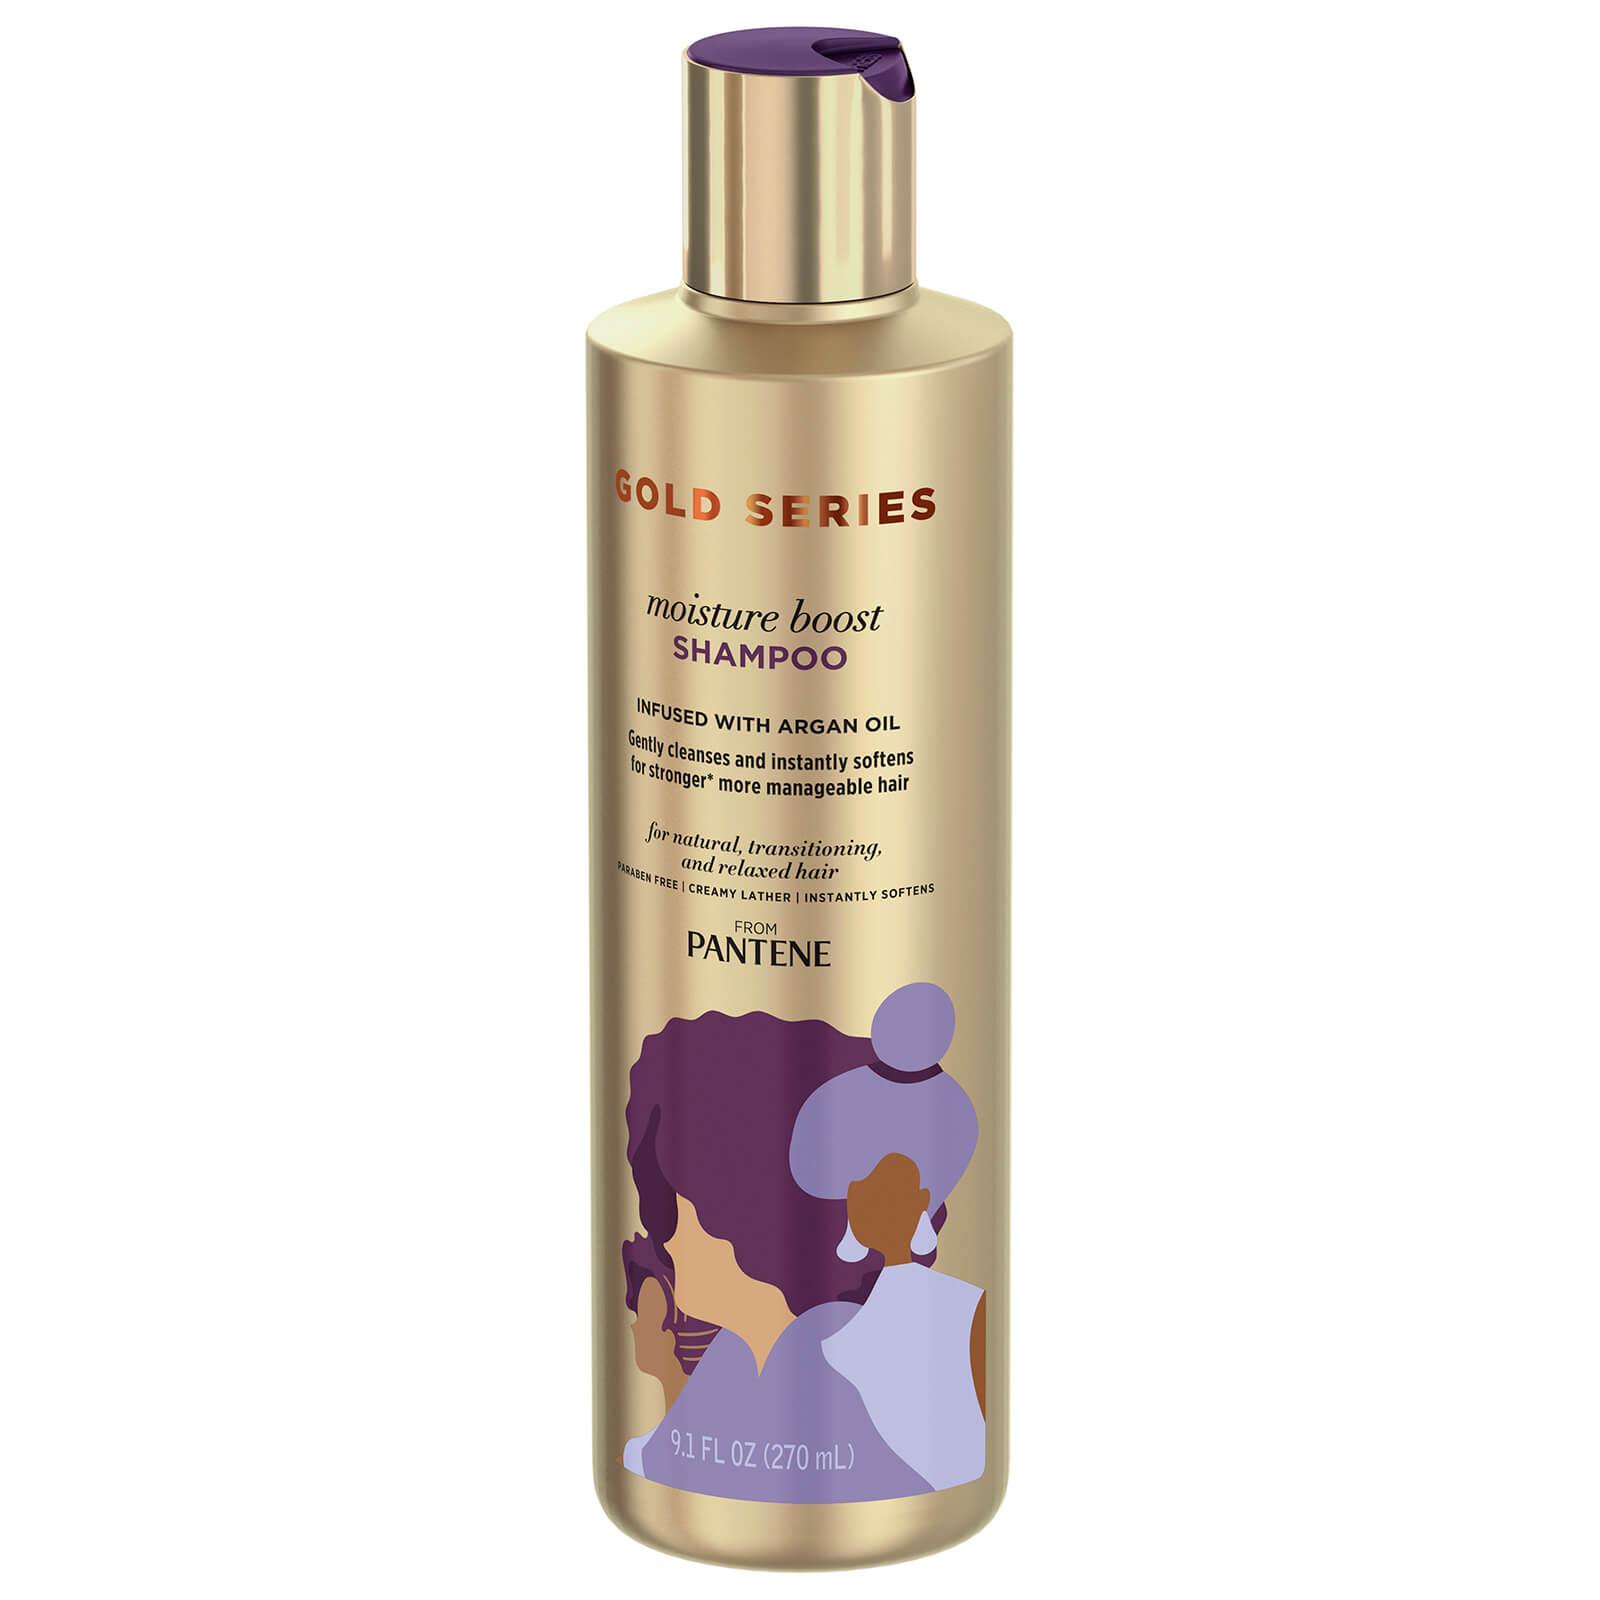 Купить Pantene Gold Series Moisture Boost Shampoo 270ml